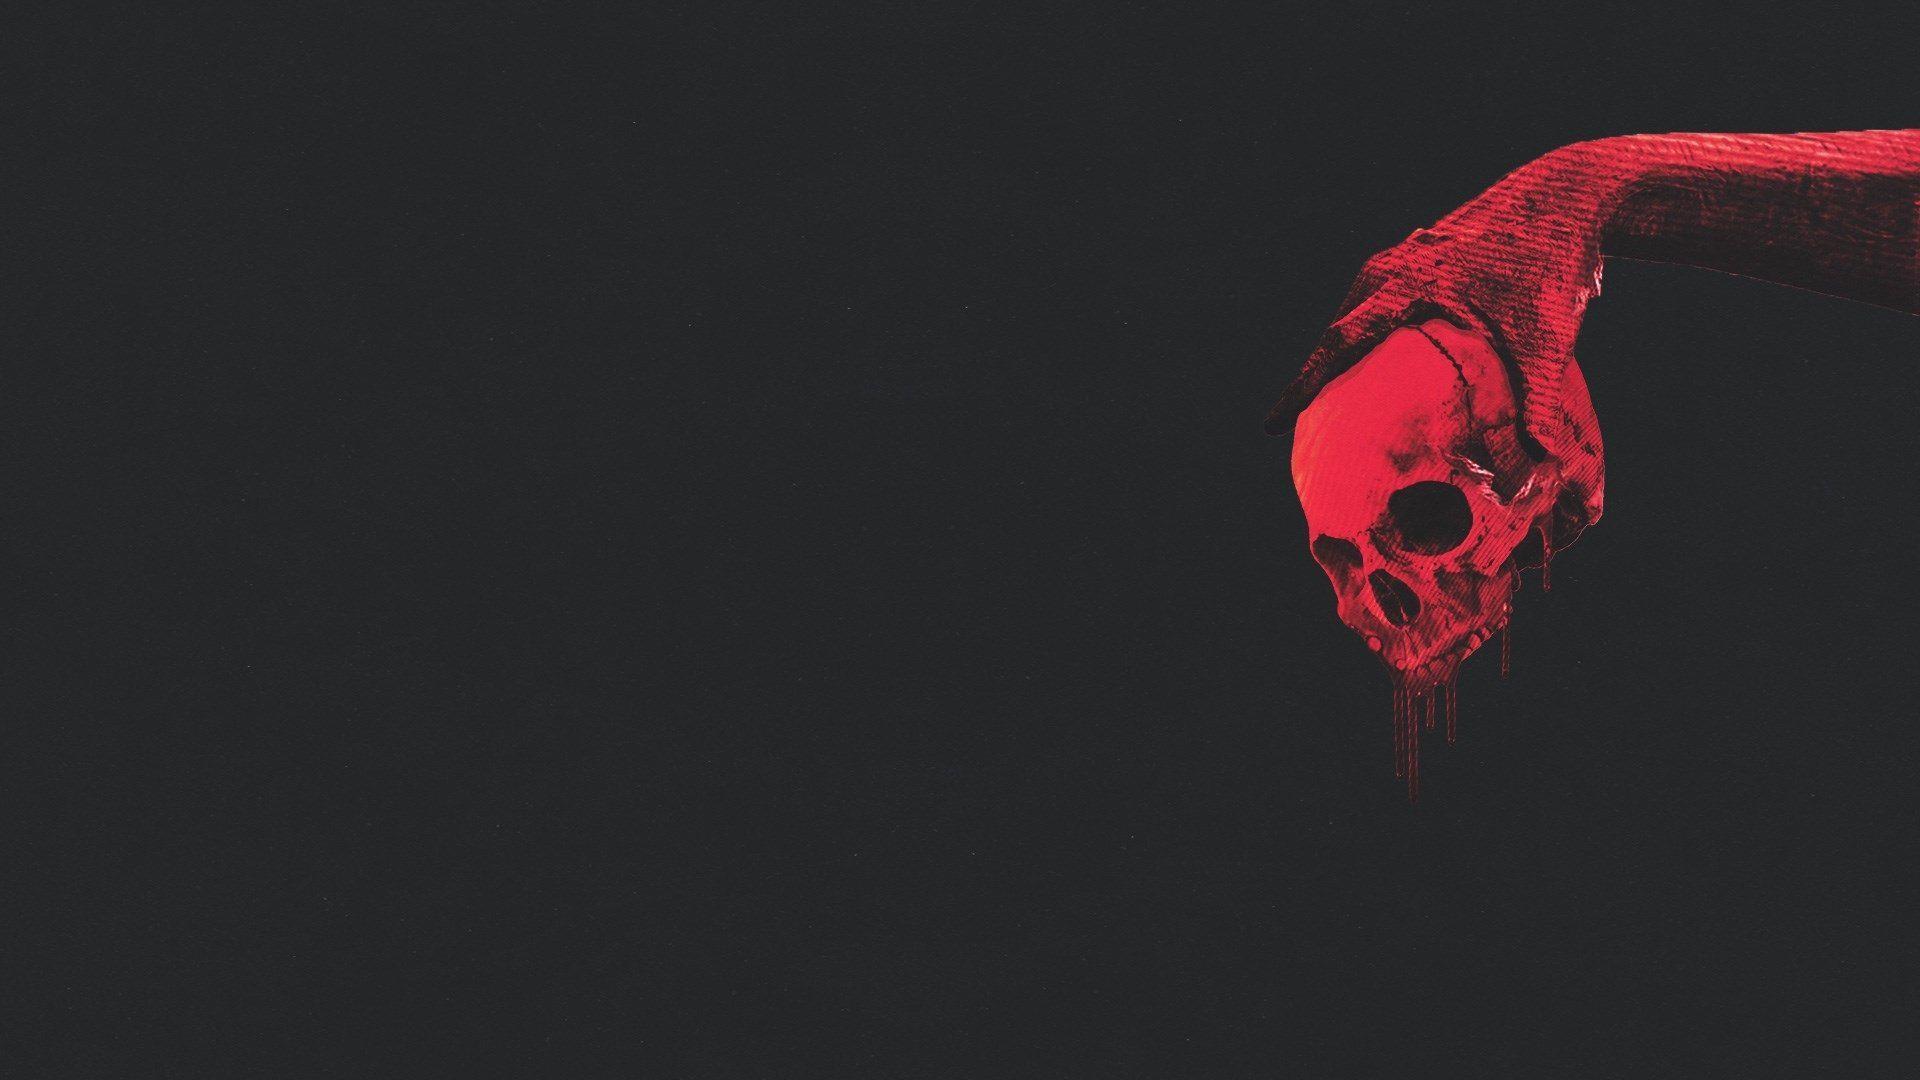 Cute Desktop Wallpaper Download Free 4k Full Hd Wallpapers Images Skull Wallpaper Hd Skull Wallpapers Cute Desktop Wallpaper